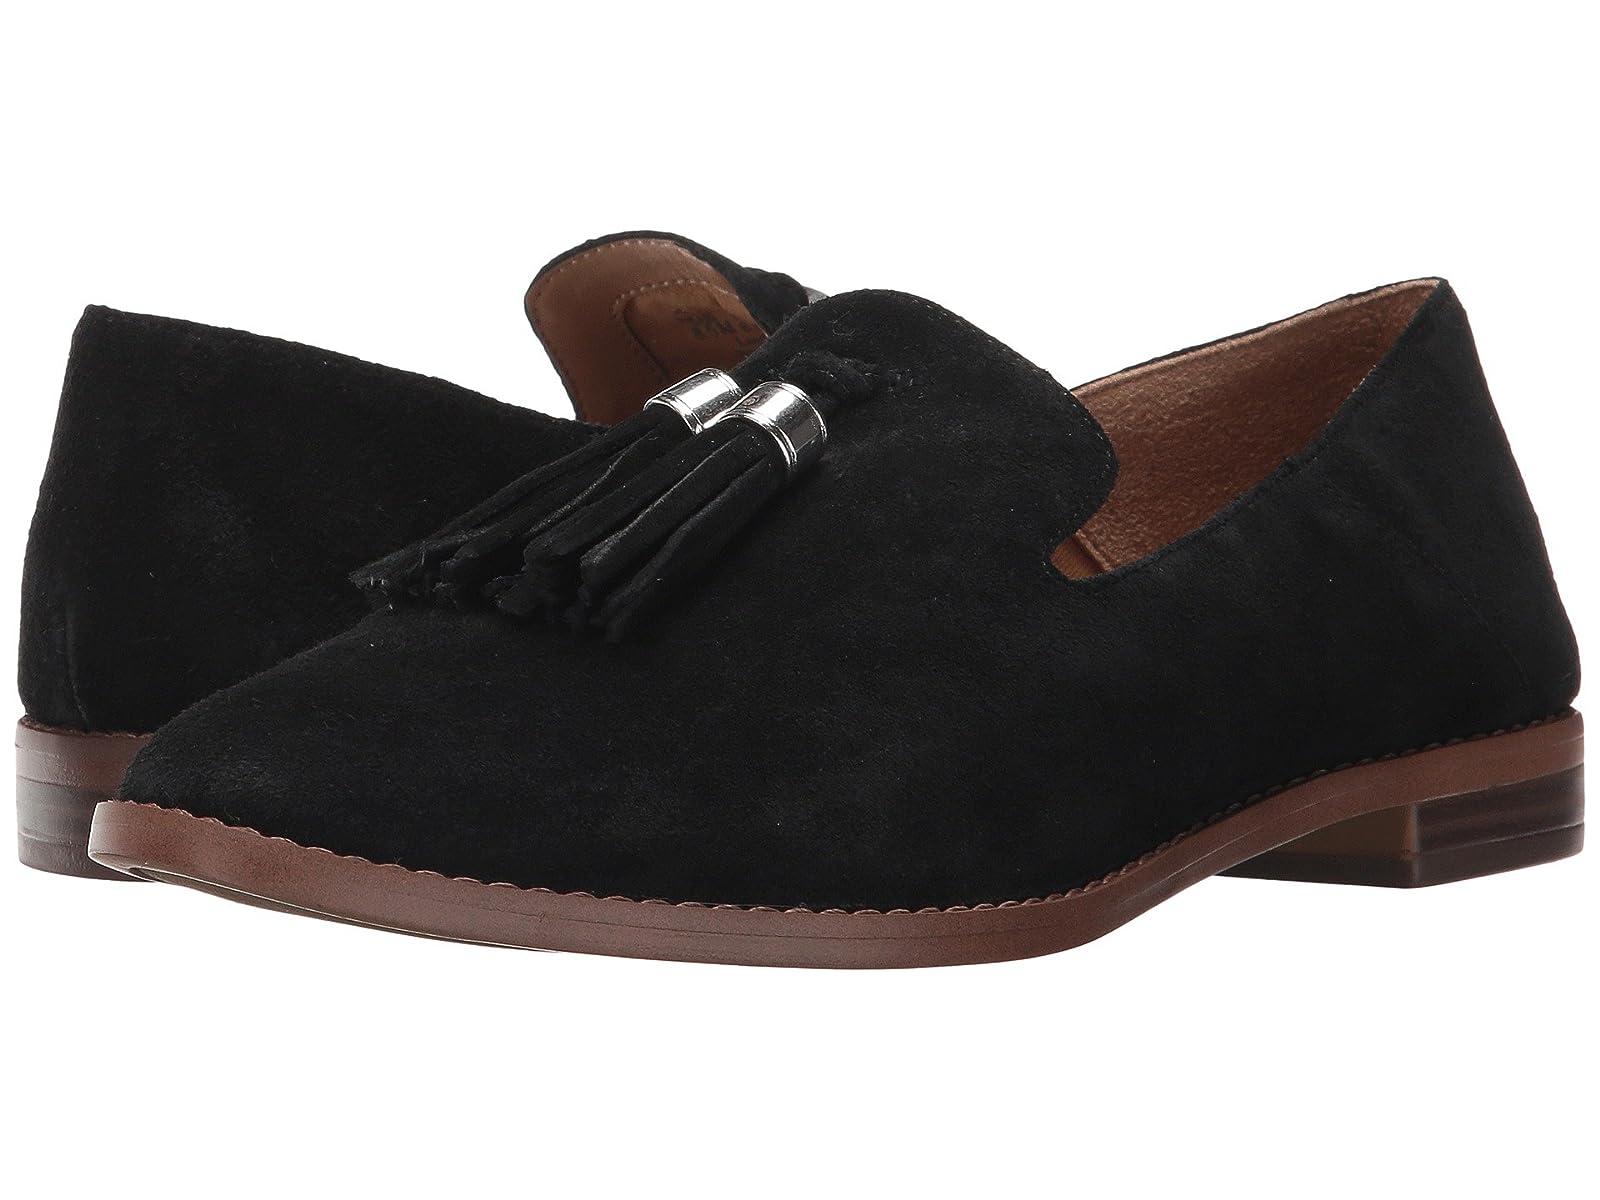 Franco Sarto HaddenAtmospheric grades have affordable shoes